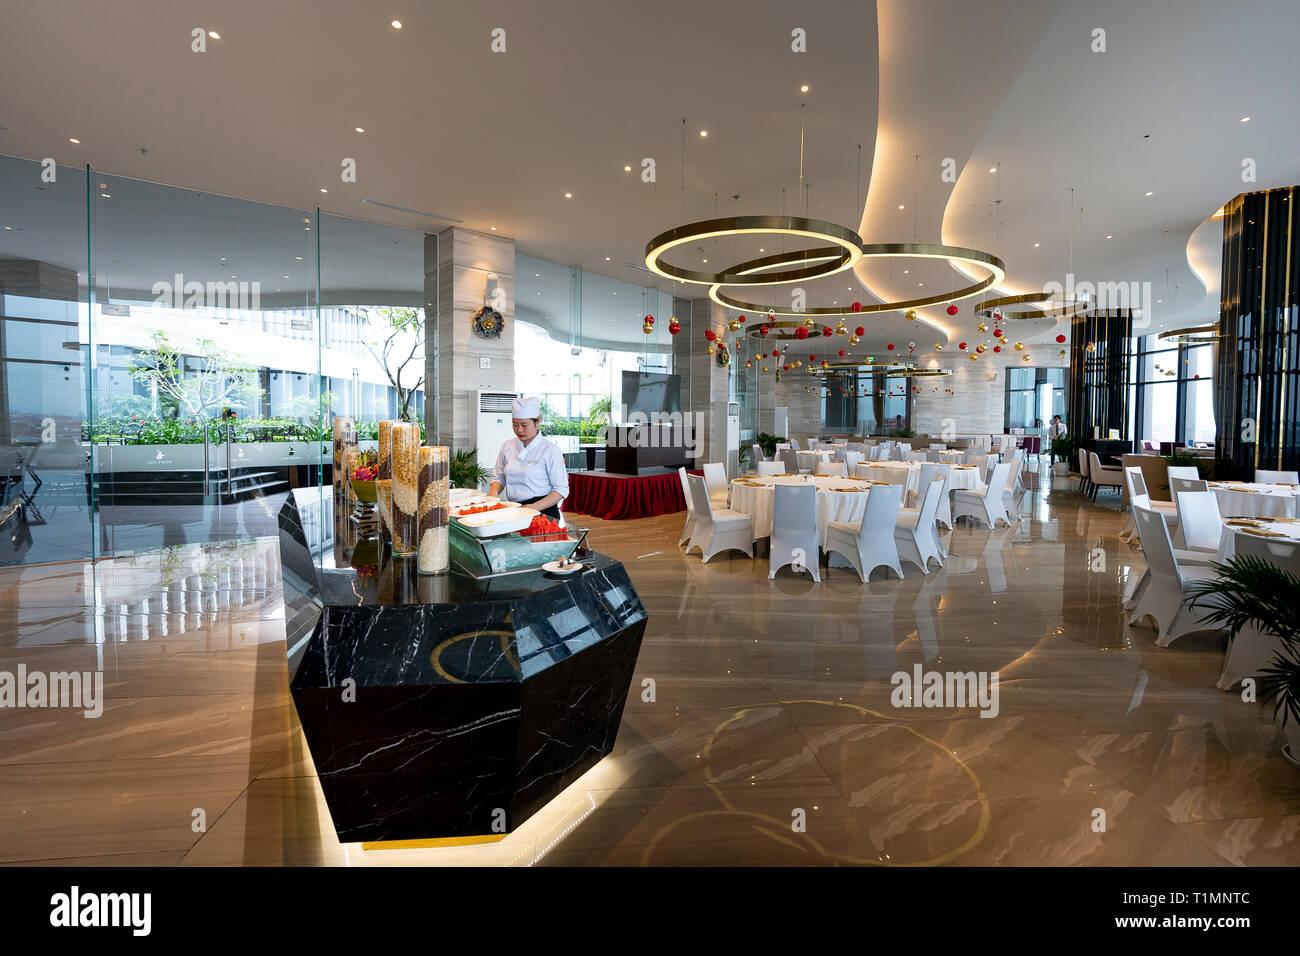 Five-star hotel Vinpearl, Ha Tinh province, Vietnam - December 17, 2018: Restaurant interior of five-star Vinpearl hotel in Ha Tinh city, Ha Tinh prov - Stock Image